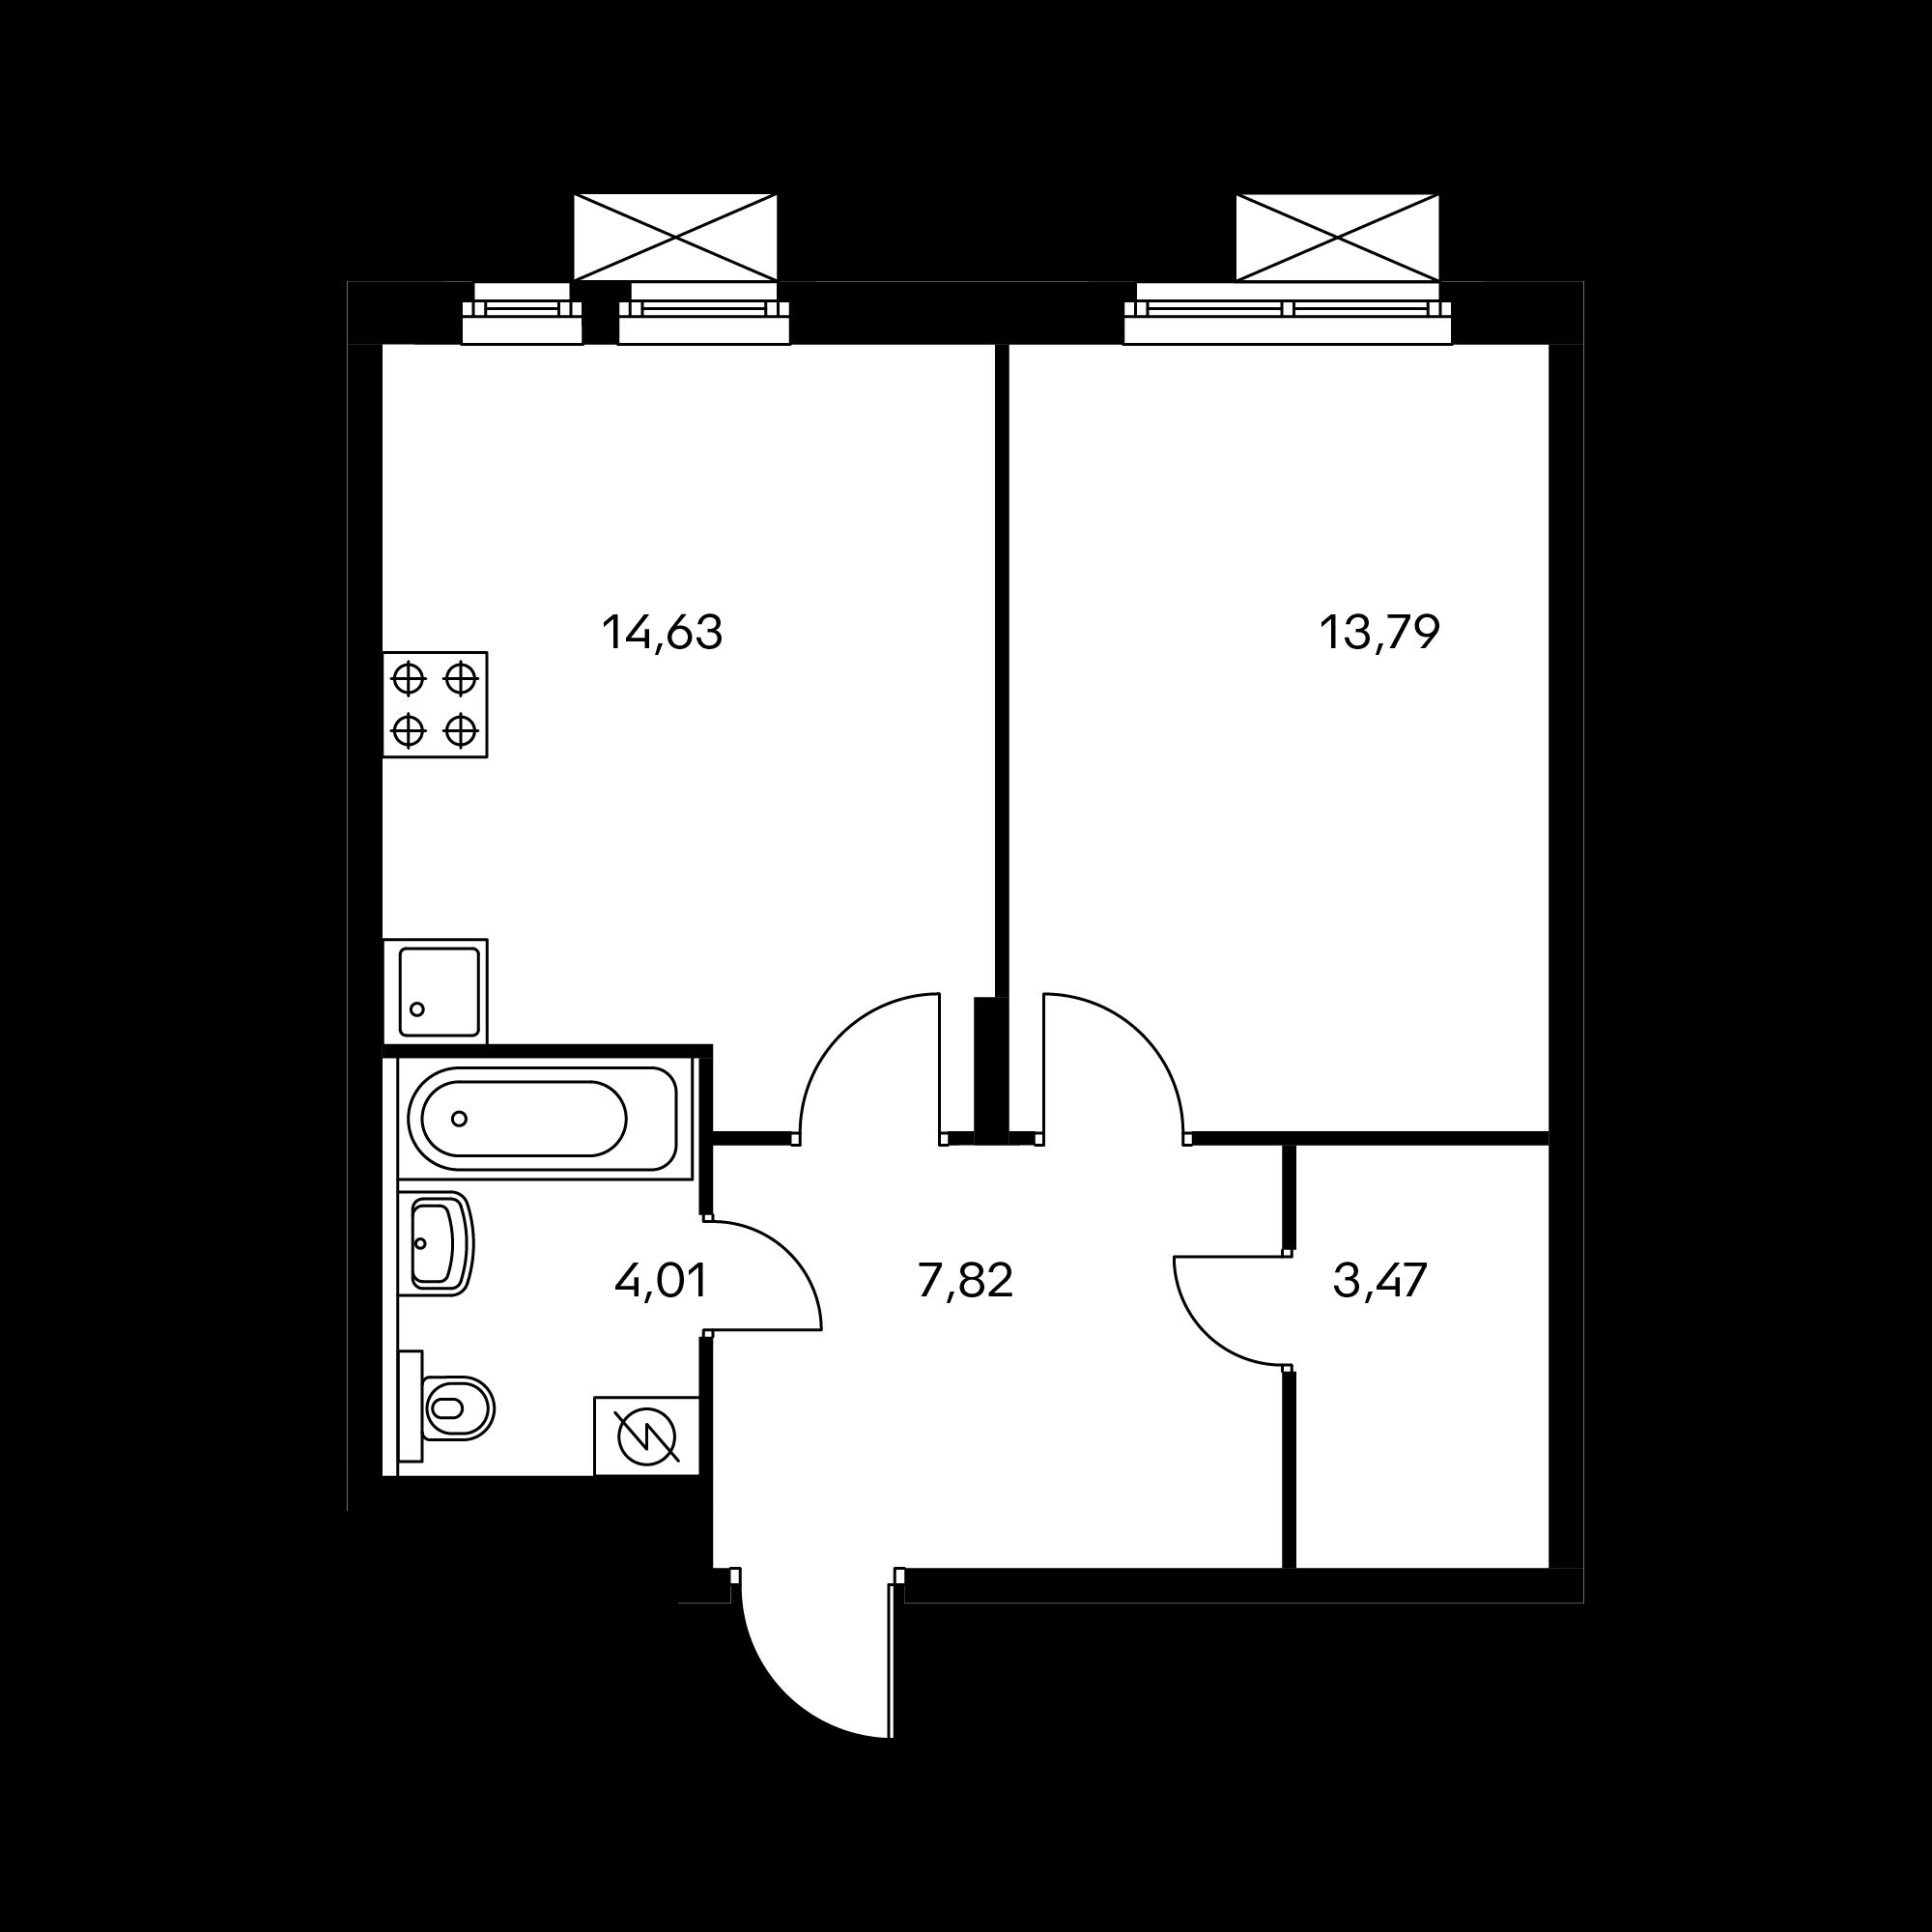 1KL1_6.9_1